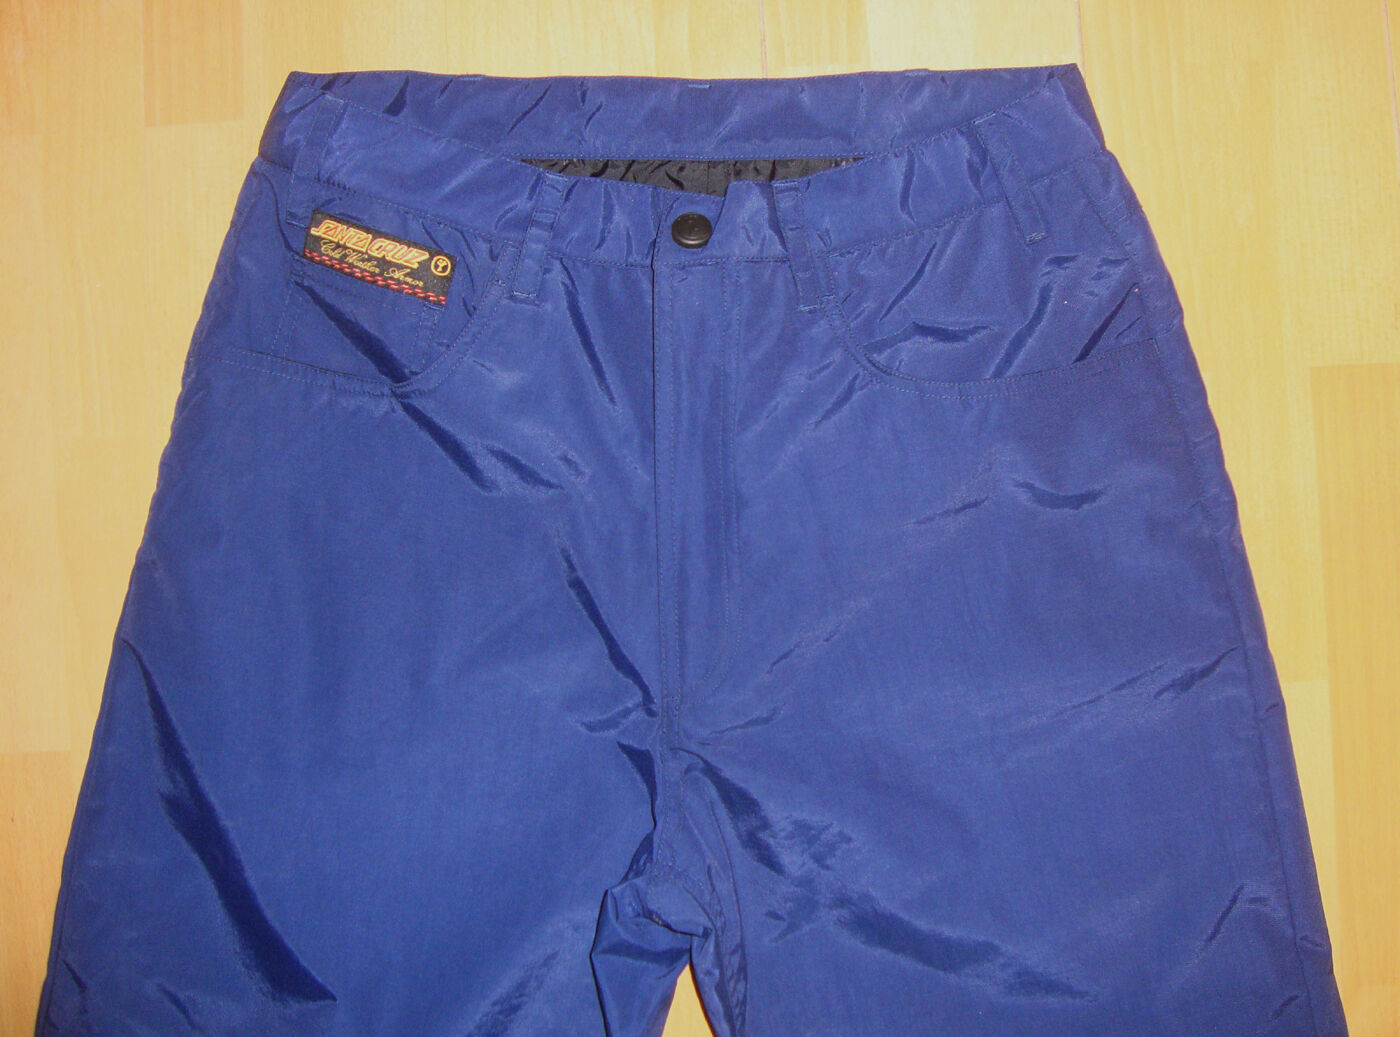 Santa Cruz Cruz Cruz - Snowboard Hose - Cutt Hose - blau 76.2cm Größe - Größe  mittelgroß d7a3c7